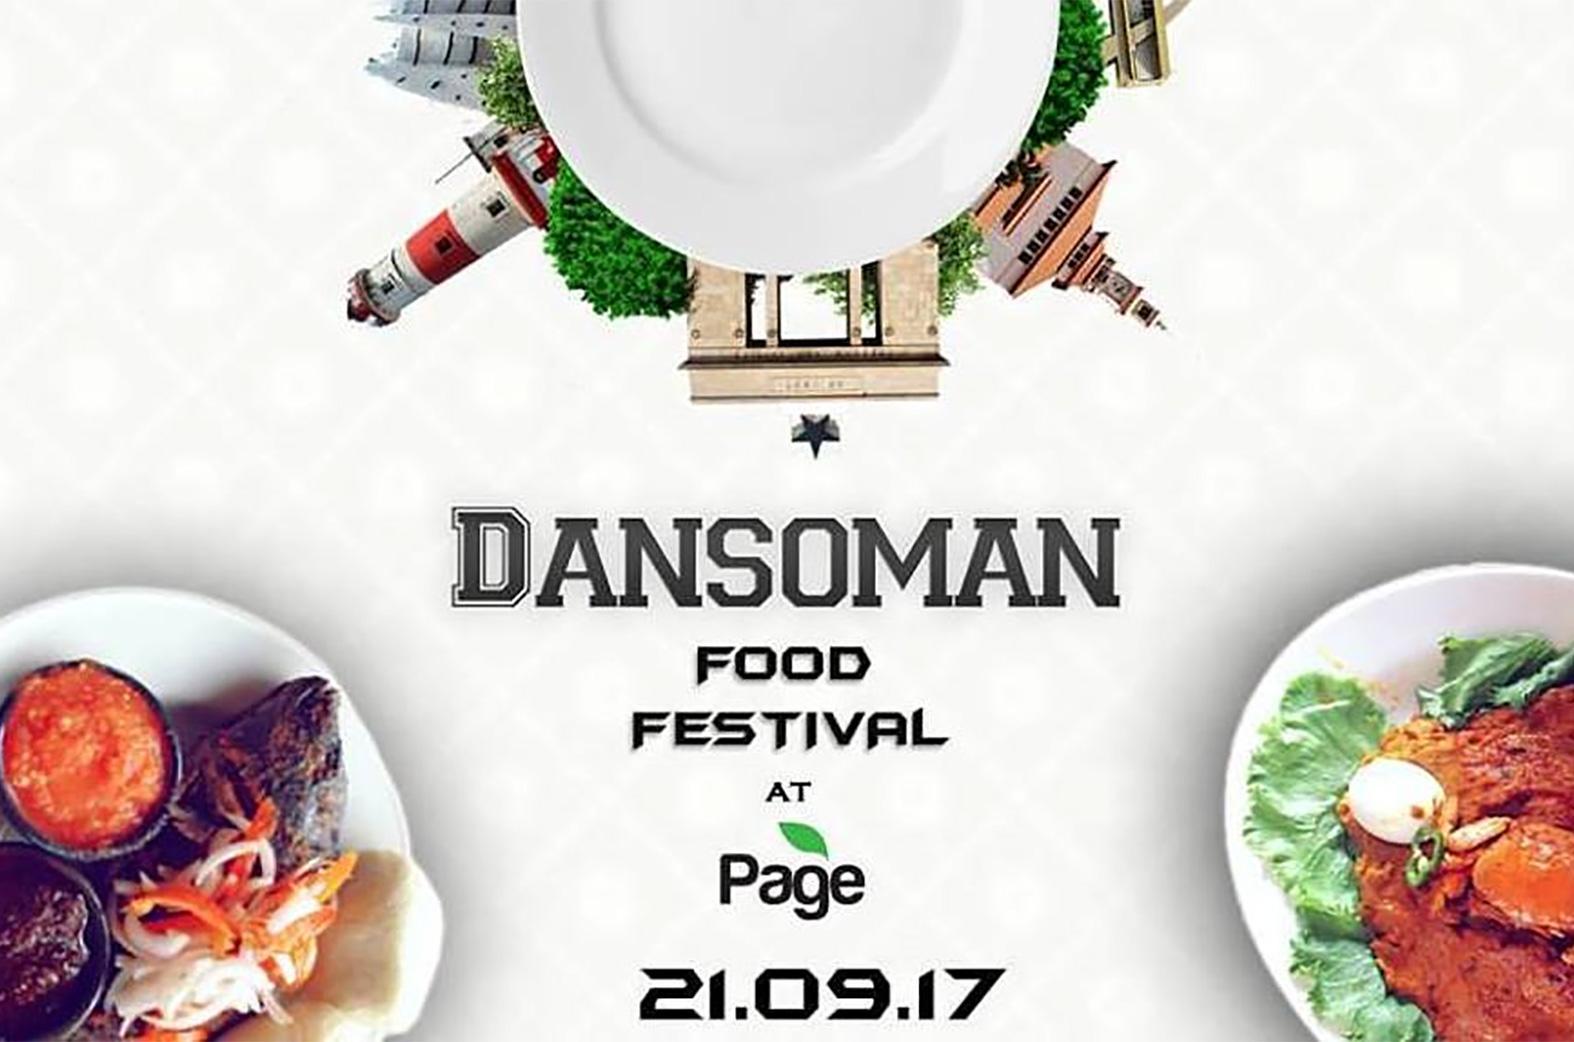 Dansoman Food Festival